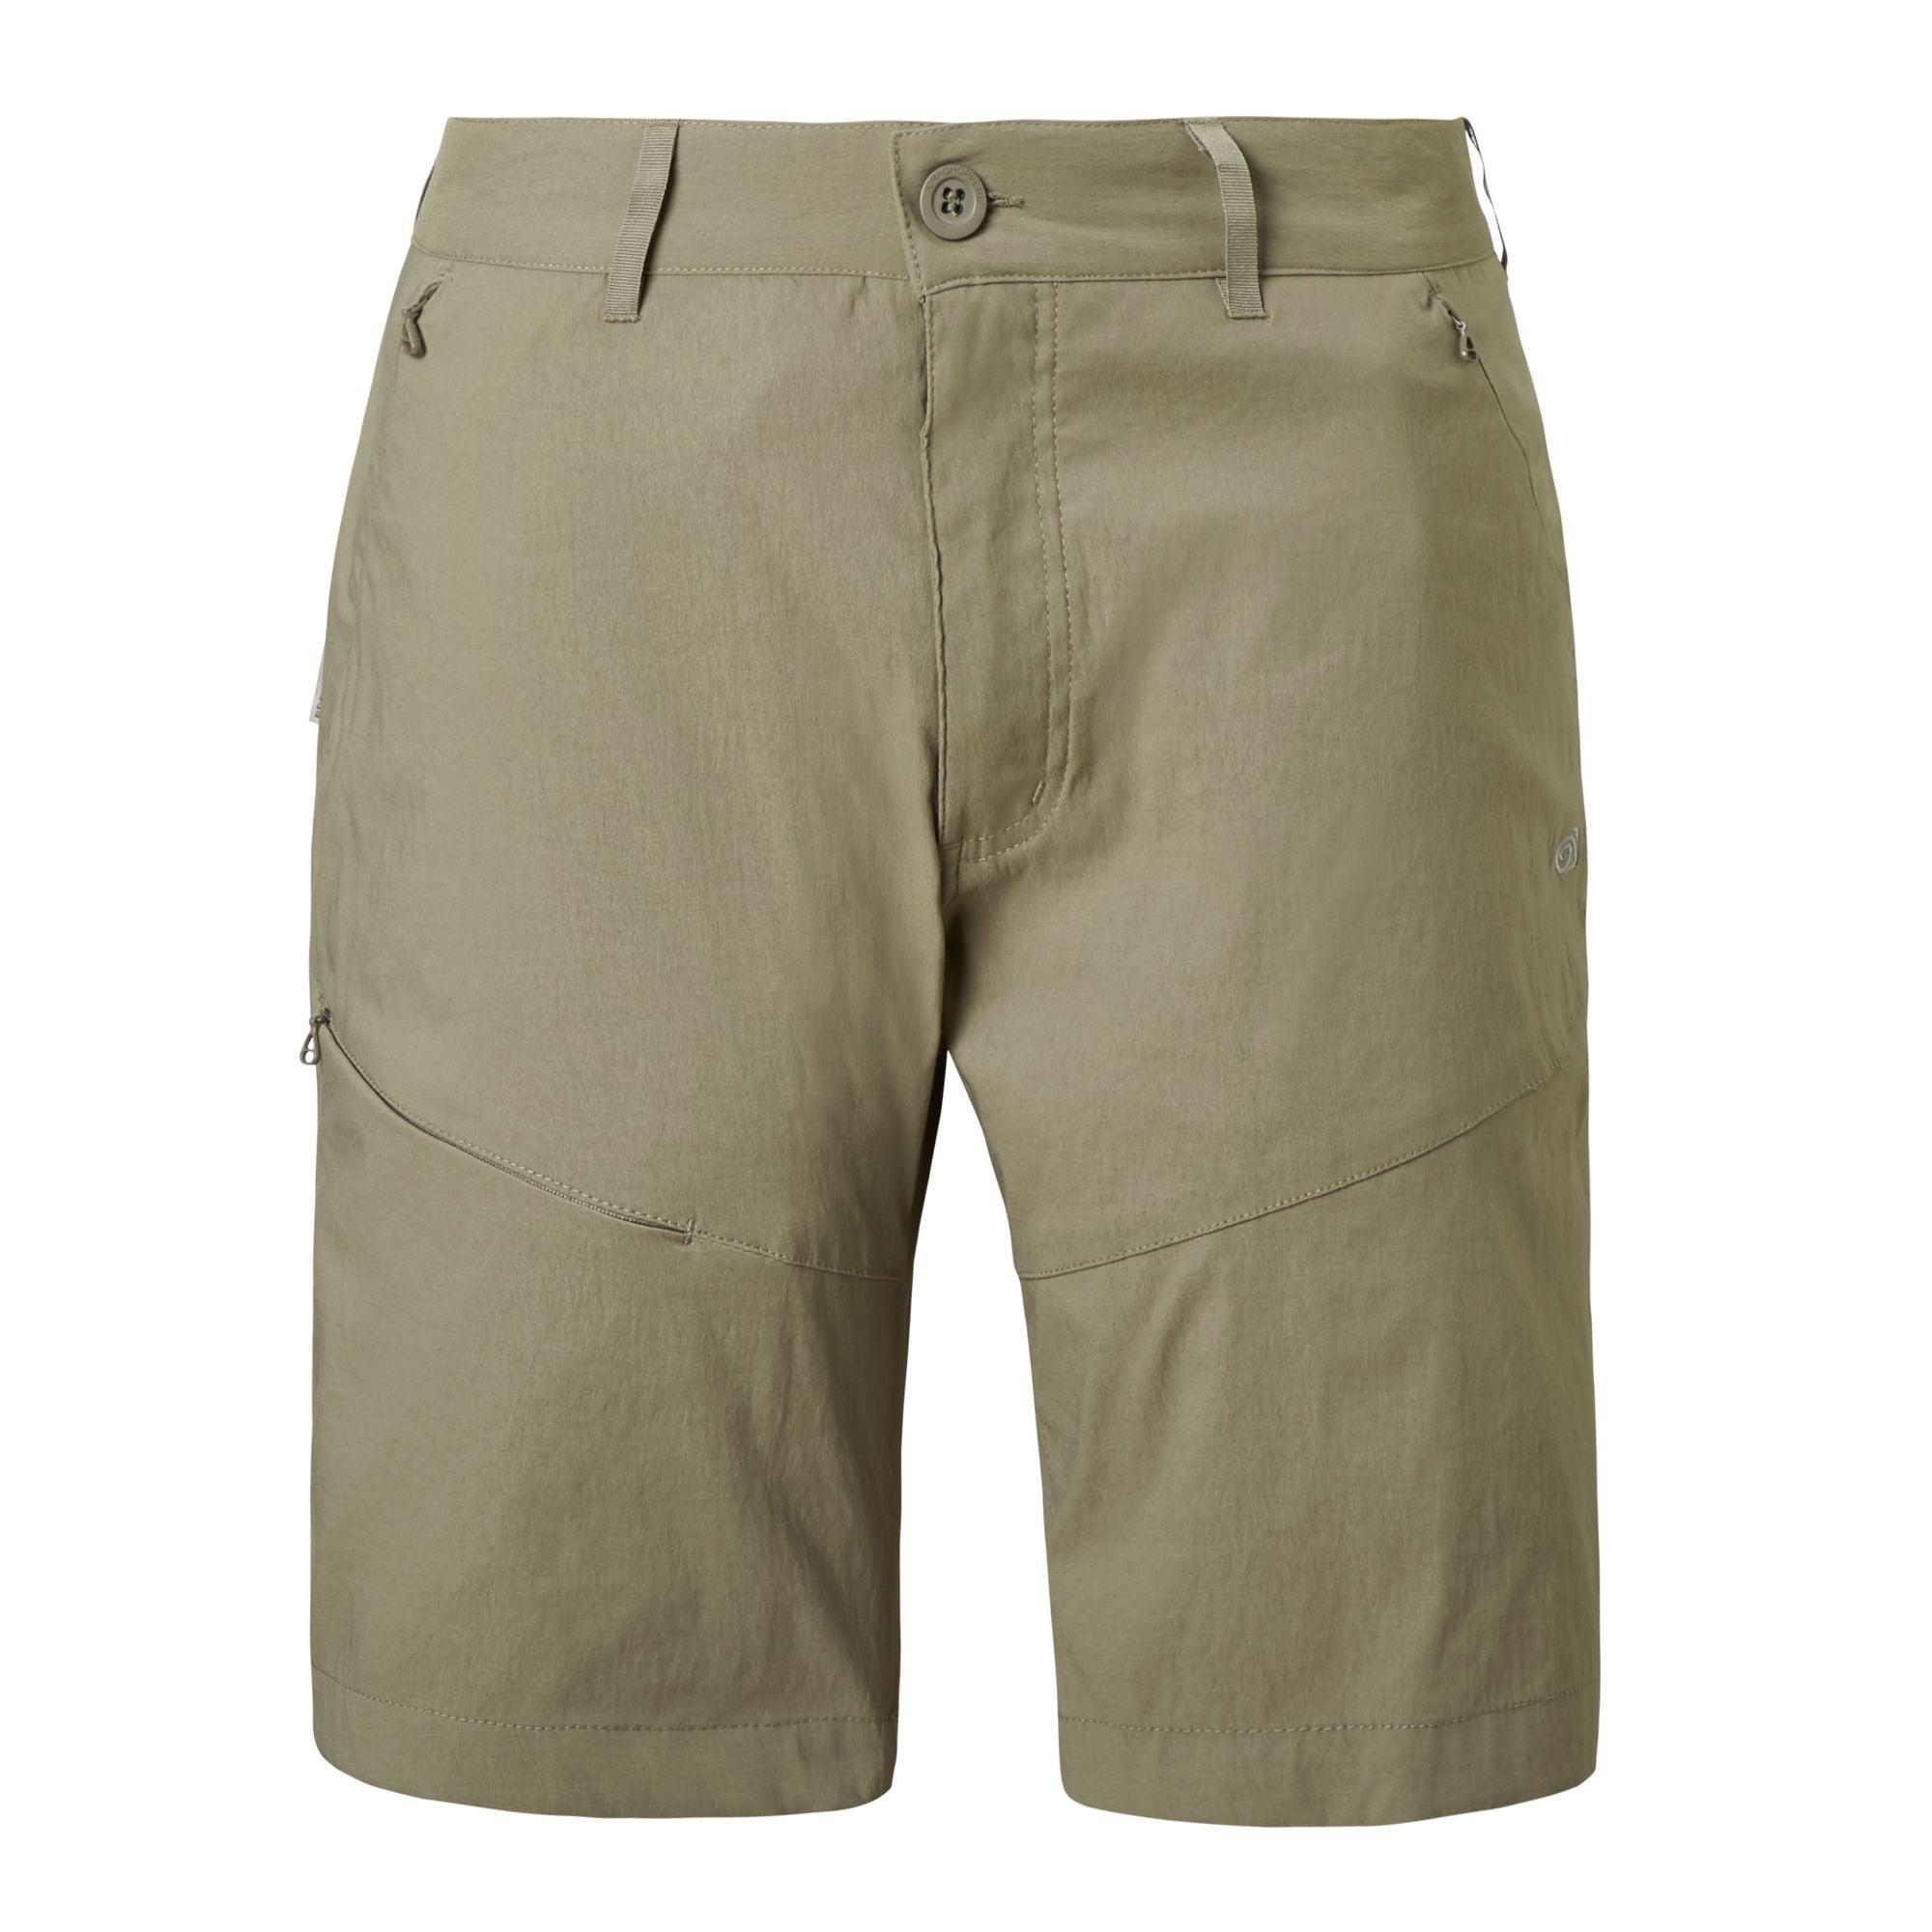 Craghoppers Mens Kiwi Pro Shorts Trousers